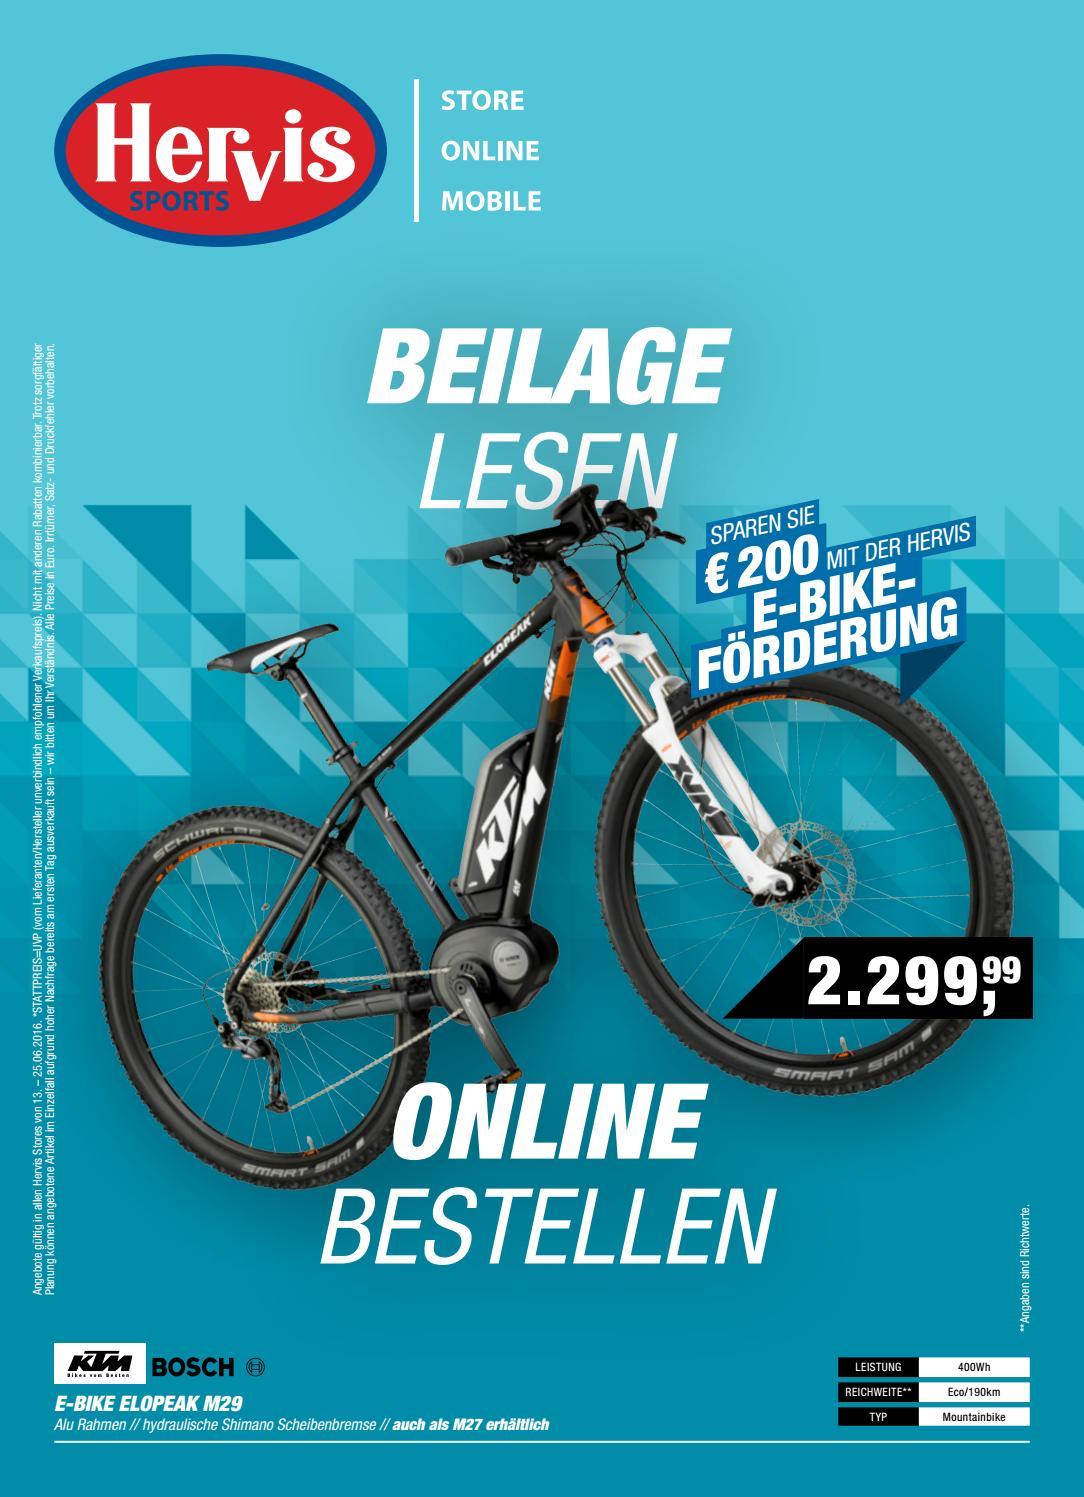 Singlespeed fahrrad in alberschwende. Dates aus wllersdorf